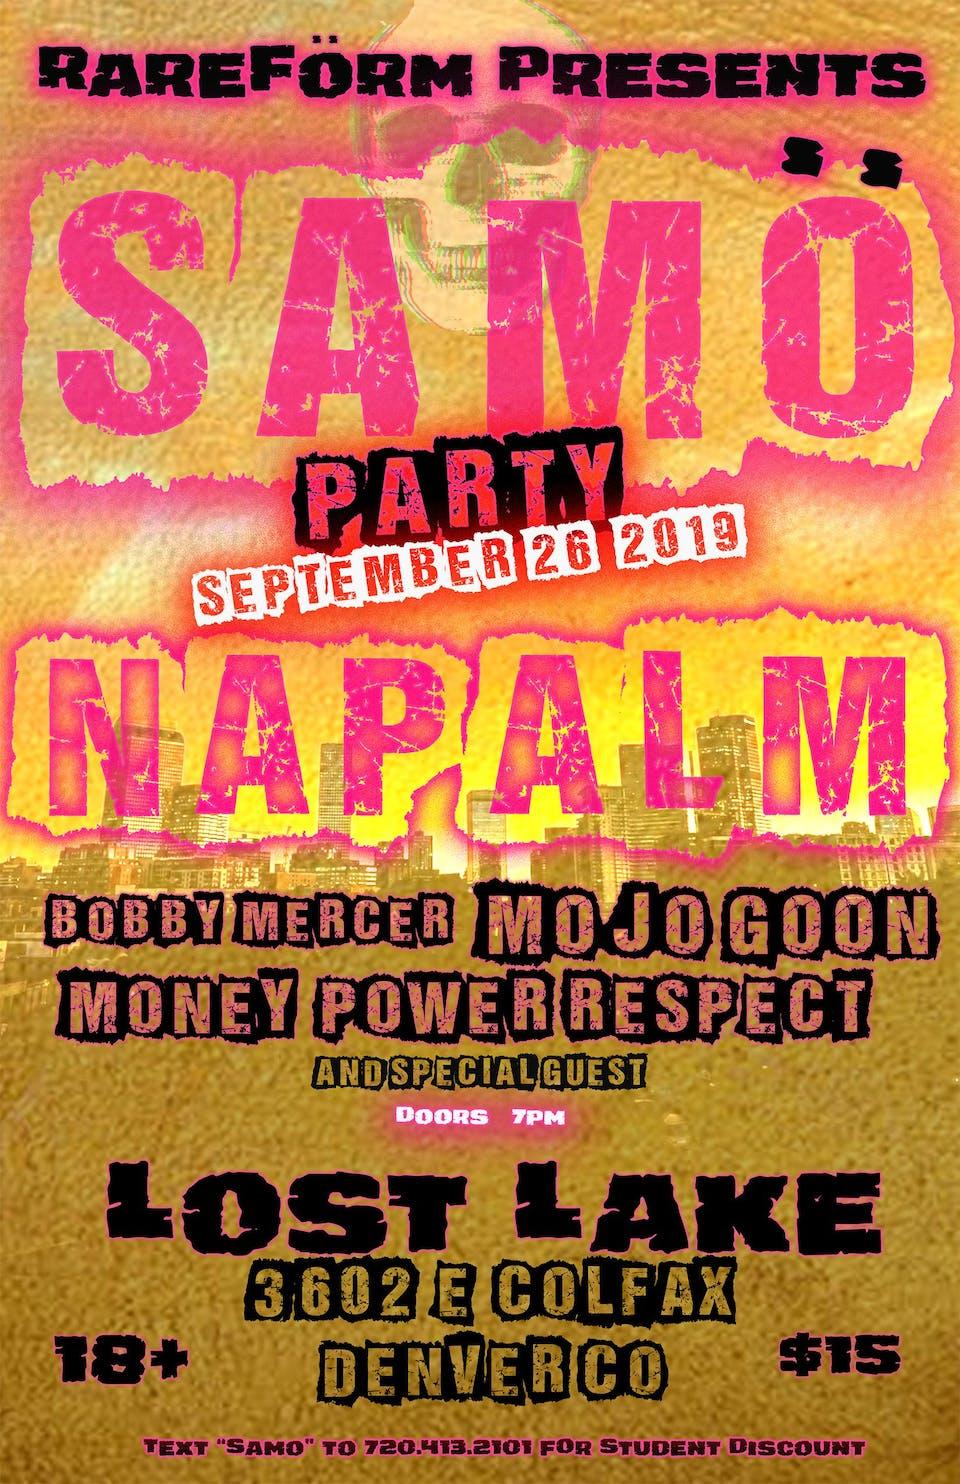 NaPalm / Bobby Mercer / Mojo Goon / Money Power Respect